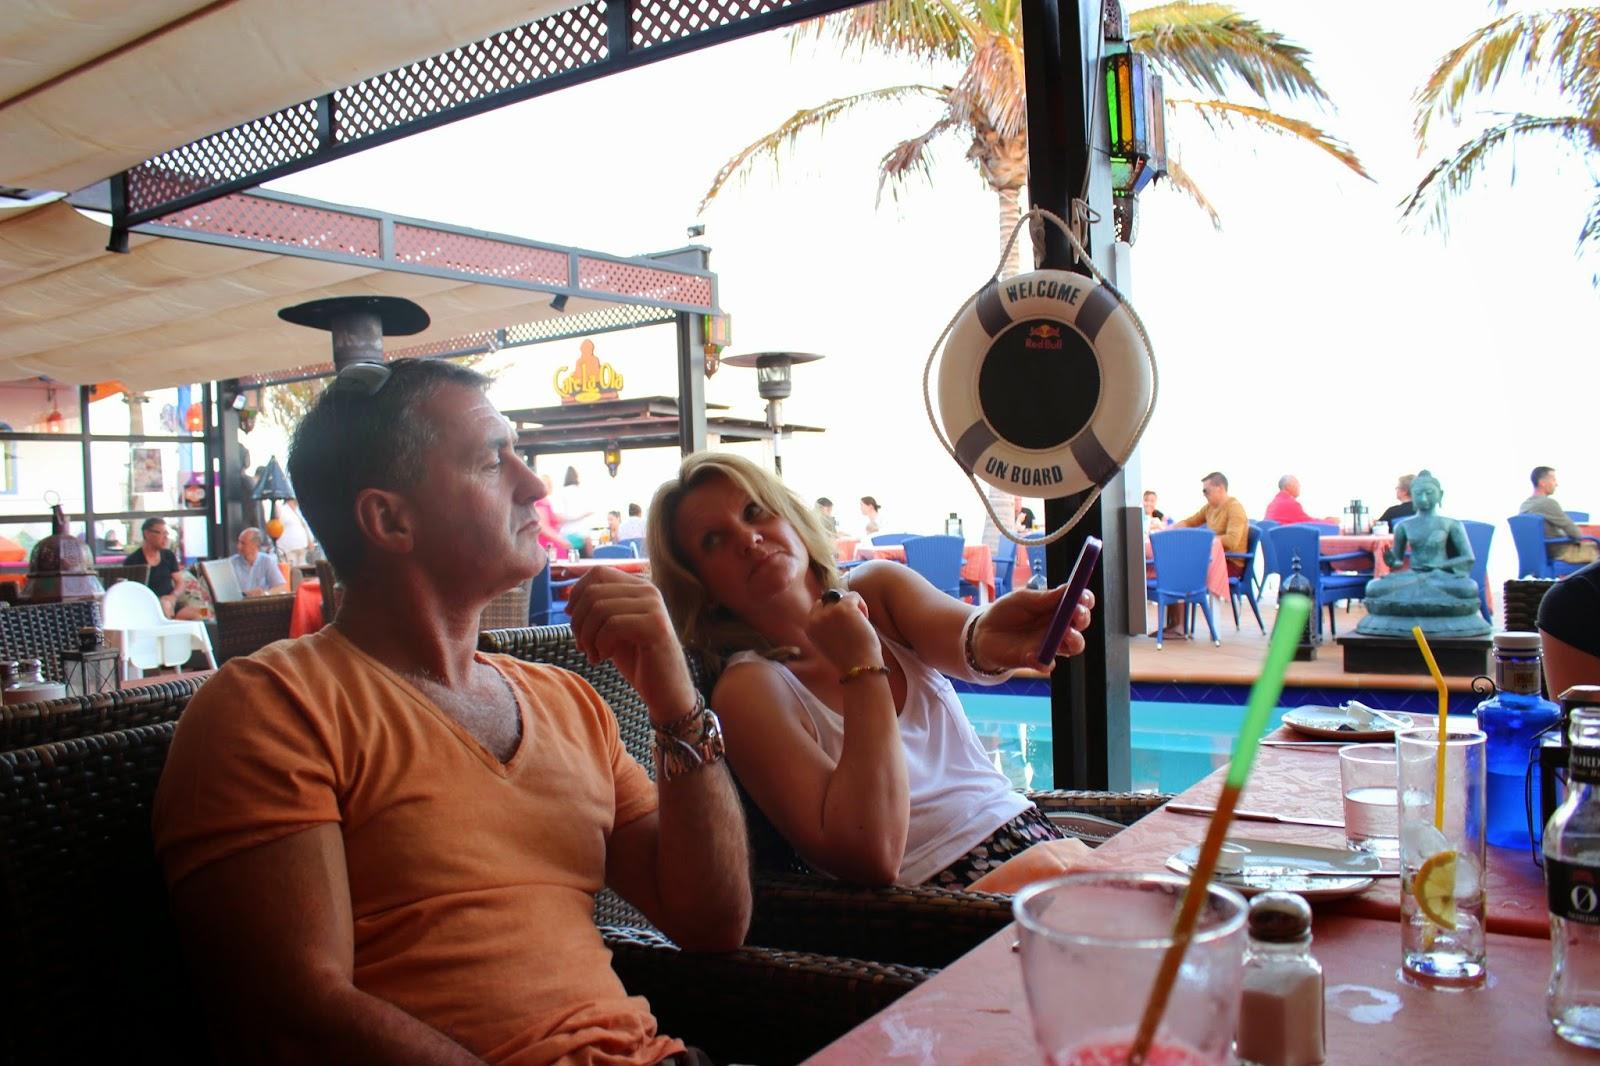 lifestyle, eating & drinking, lanzarote, holiday, beach, sunshine, summer, canary islands, swimwear, mens fashion, That Guy Luke, That Guy Lukey, men, dinner, cafe la ola, puerto del carmen, p20, ted baker flip flops,